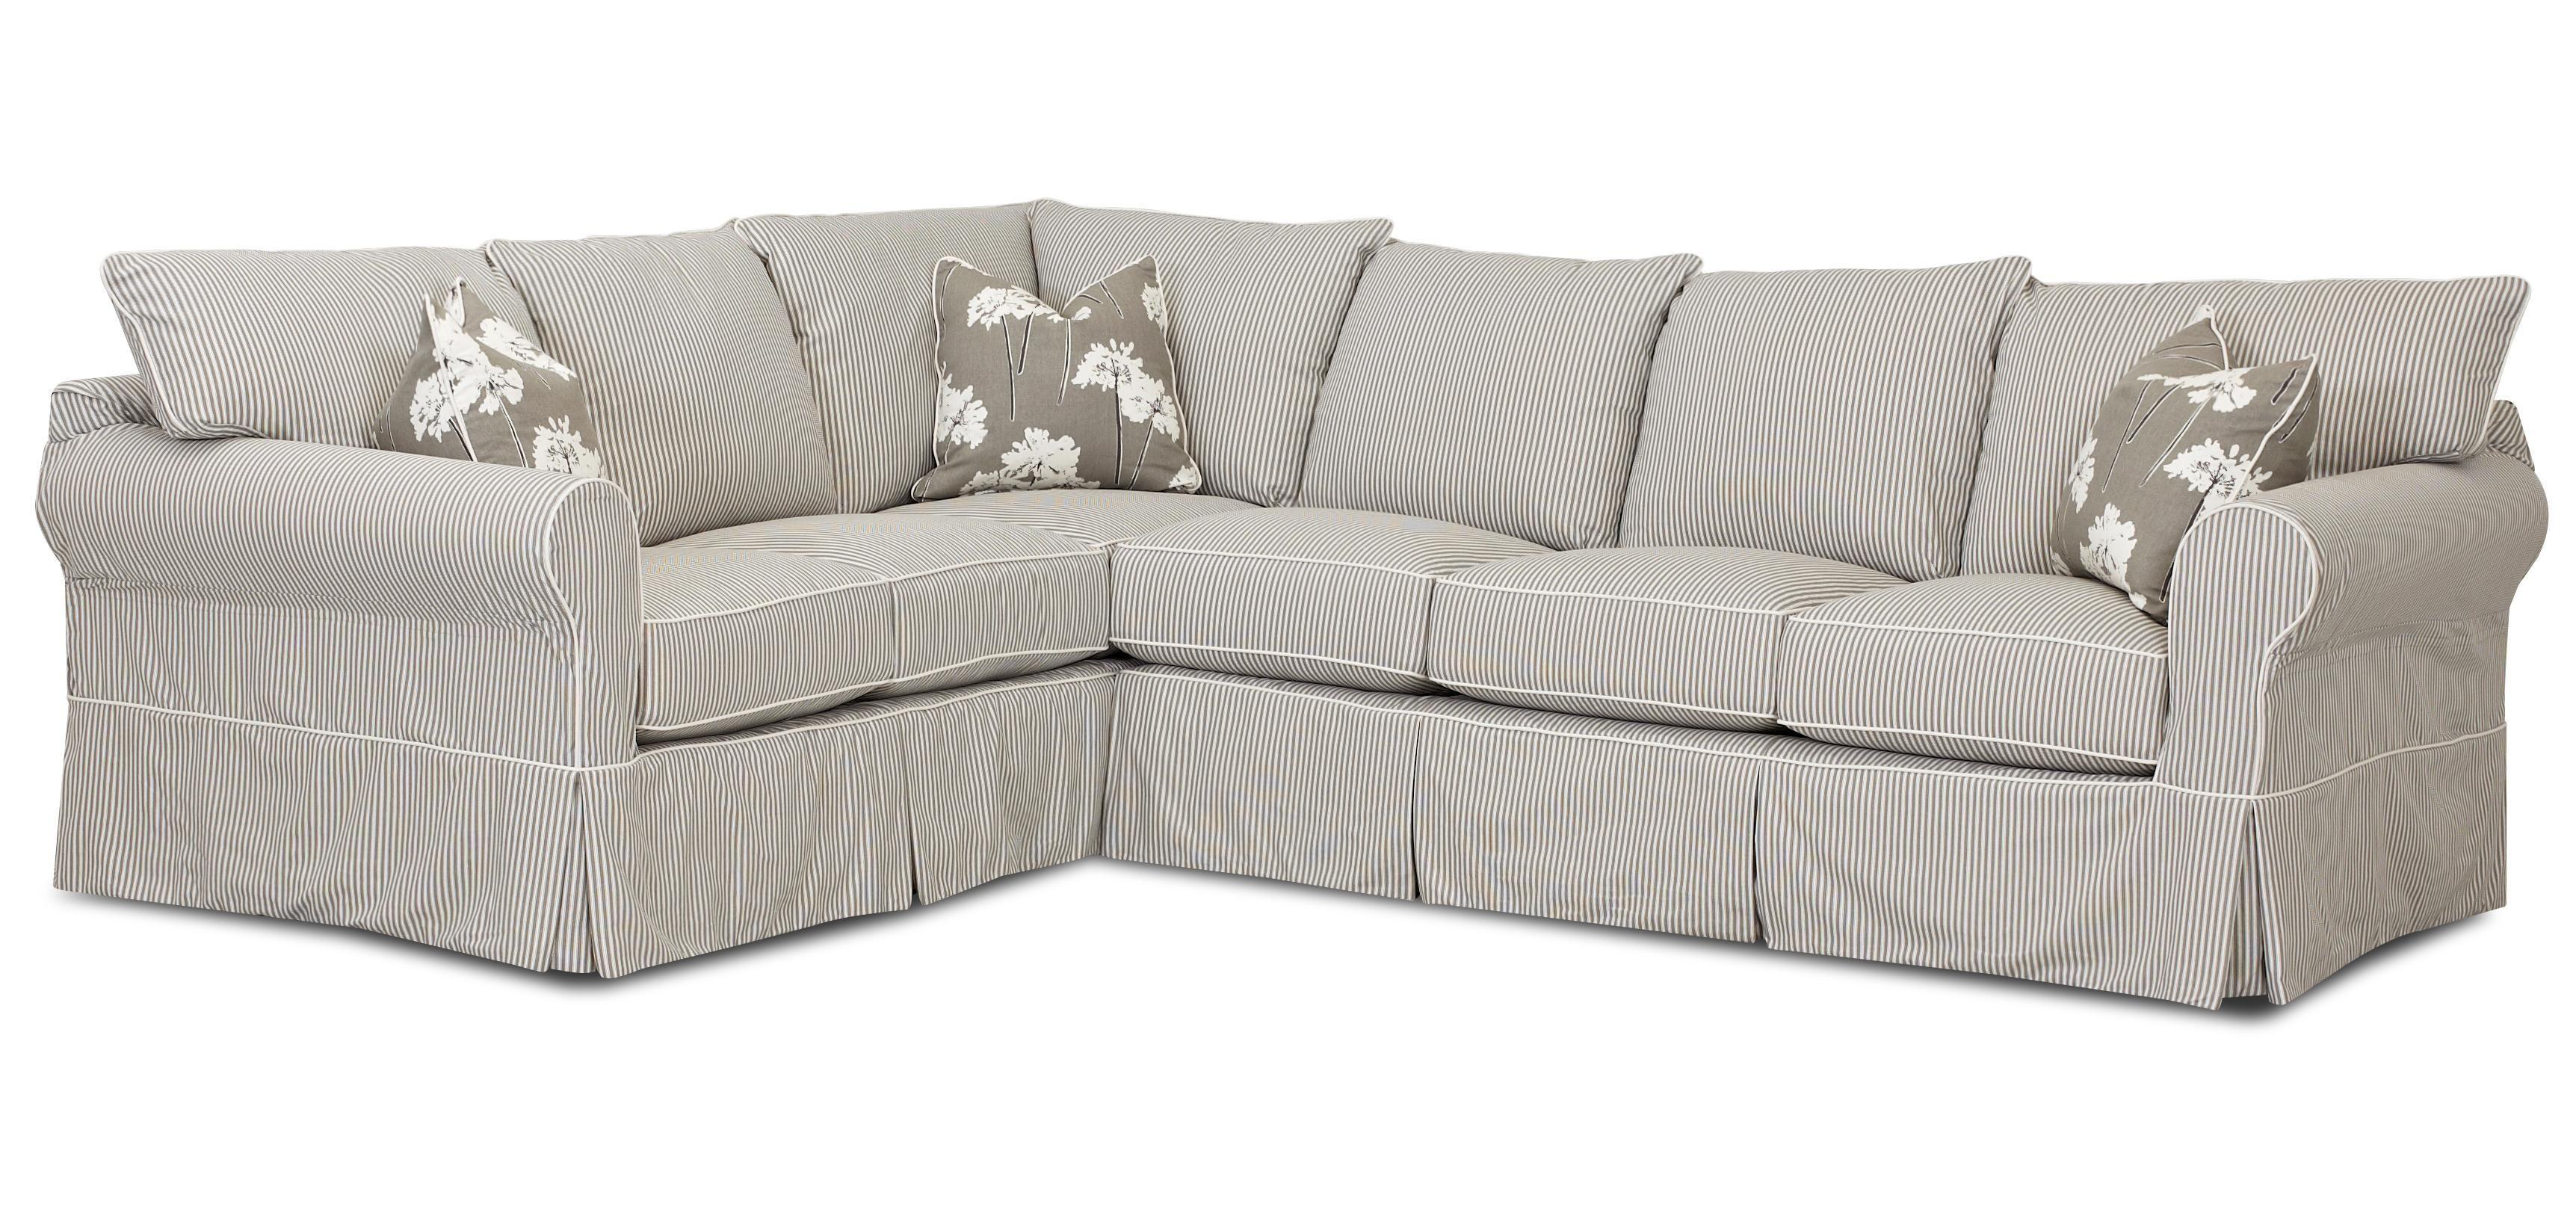 Error Suburban Furniture Succasunna Morristown Parsippany Morris County Flanders New Jersey 2 Piece Sectional Sofa Sectional Sofa Suburban Furniture